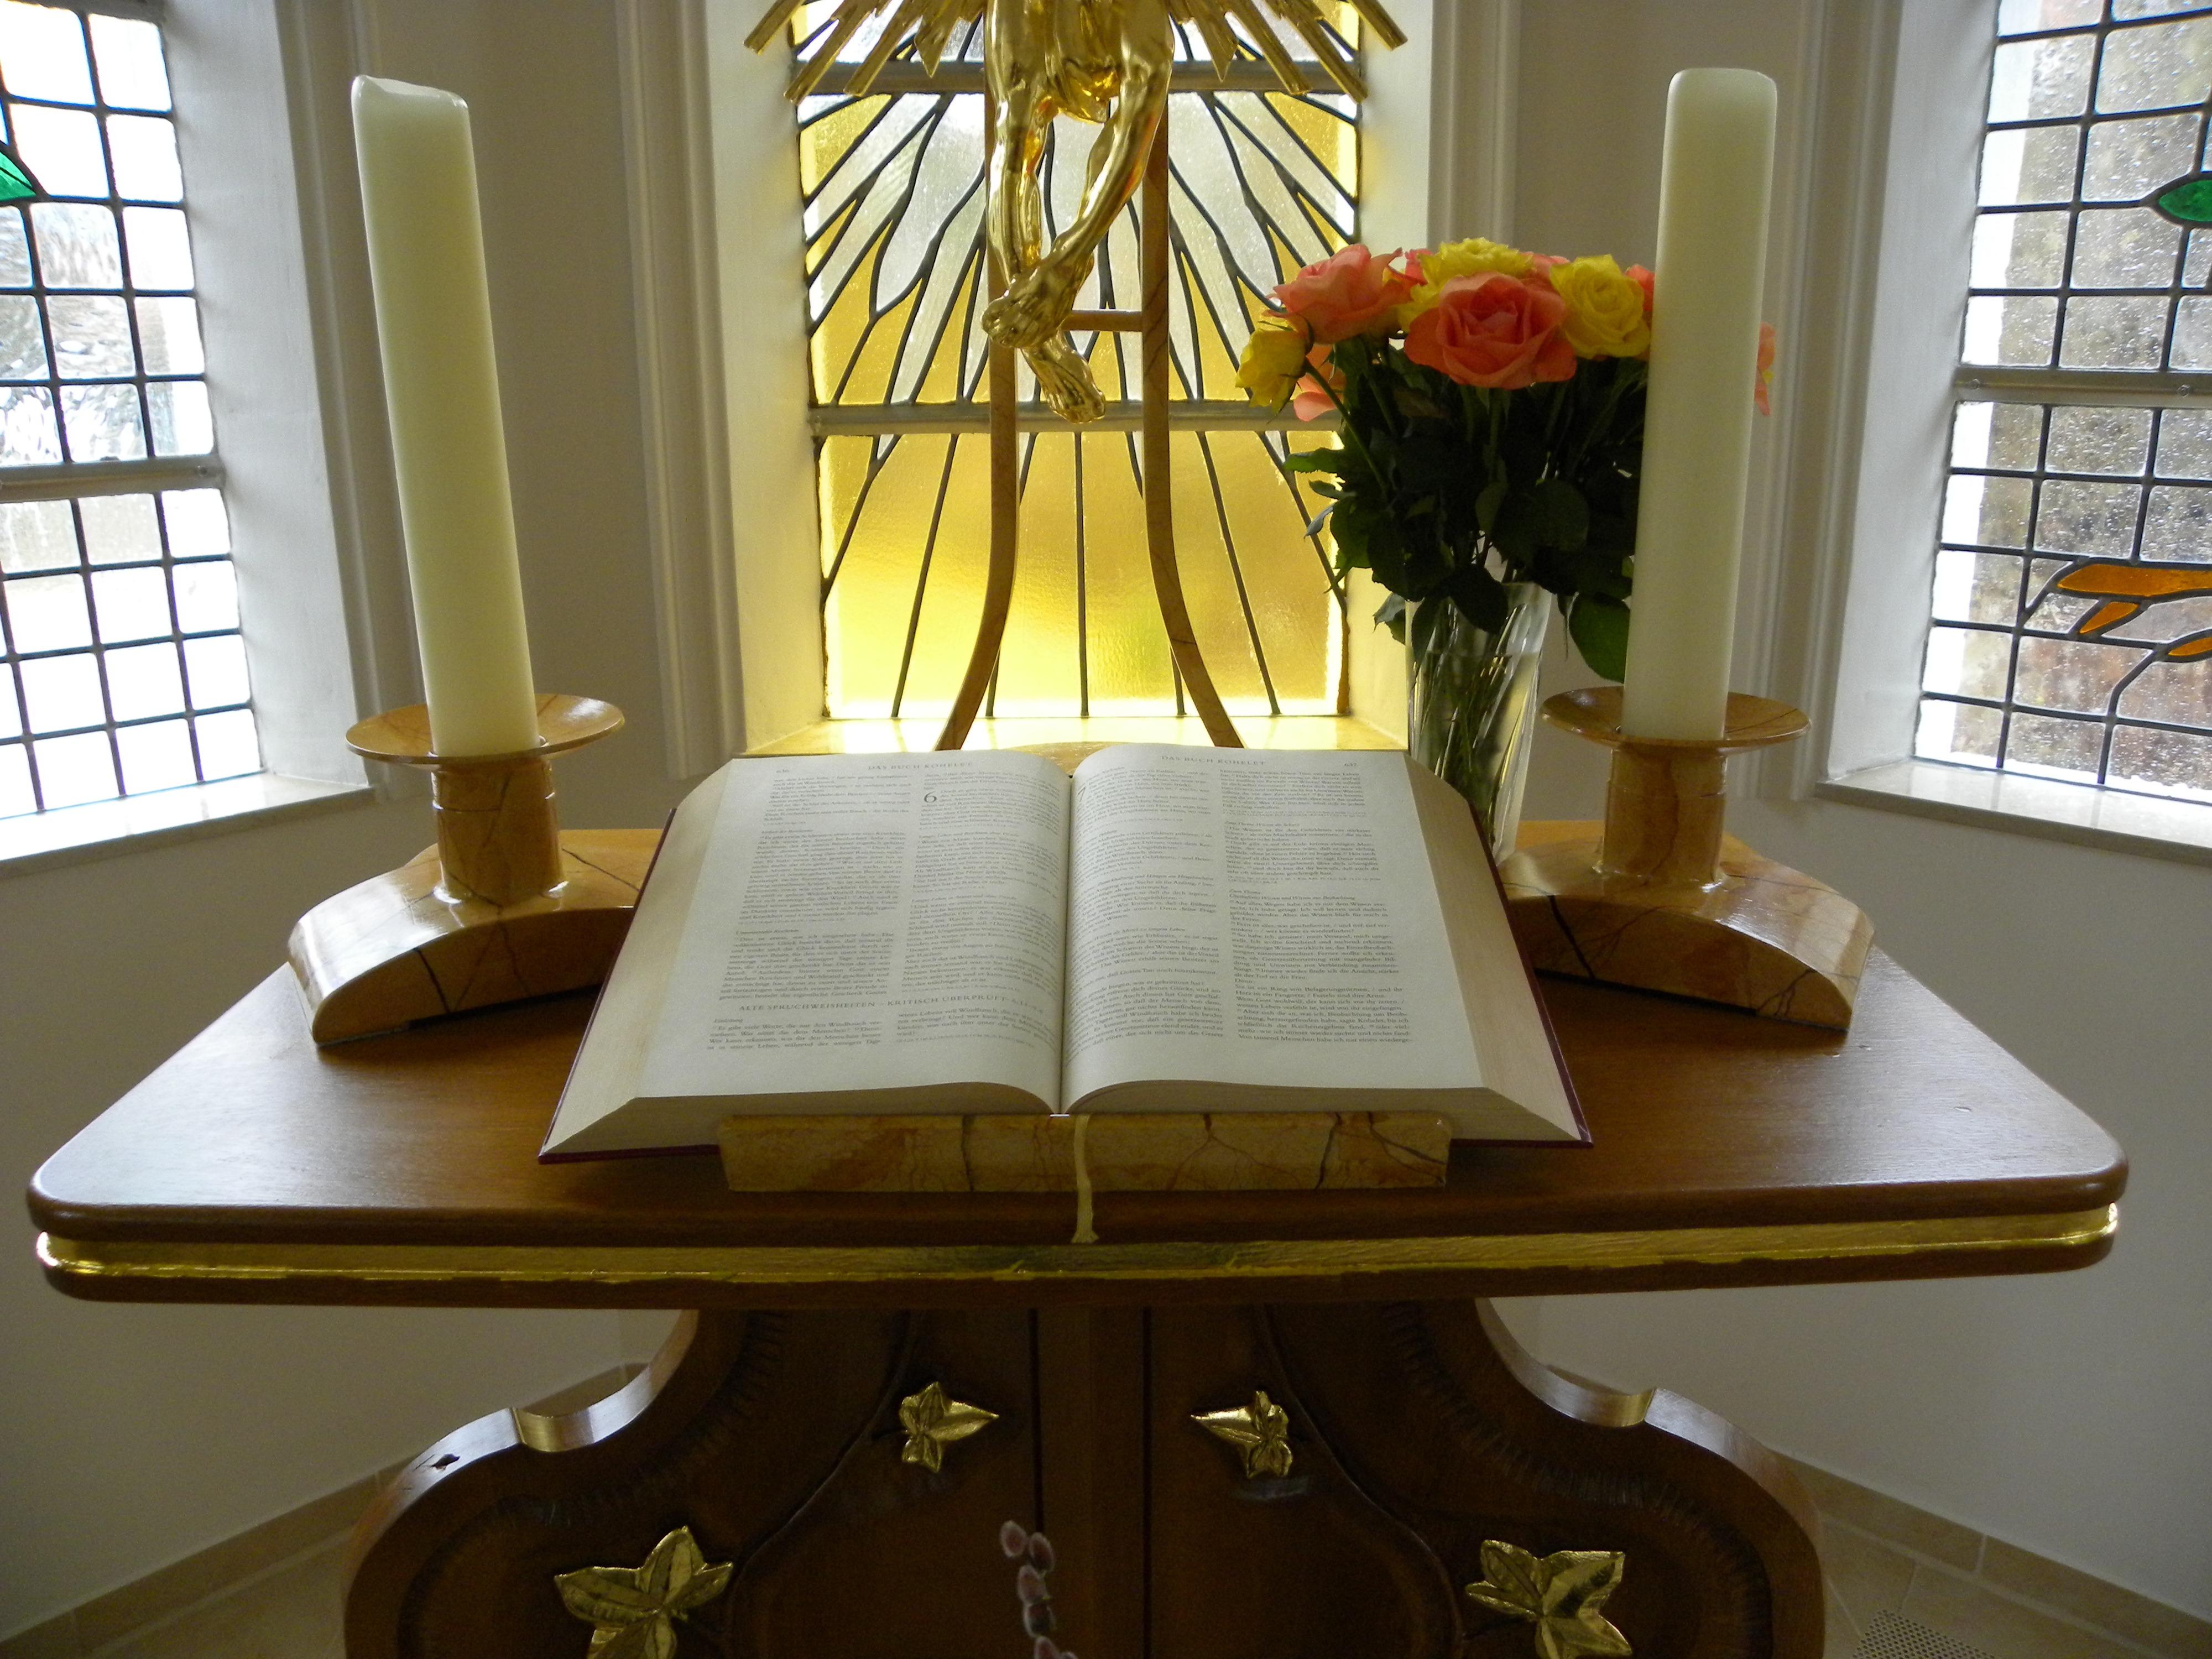 Table Wood Home Religion Church Chapel Furniture Room Christian Bible Pray Interior Design Art Altar Faith